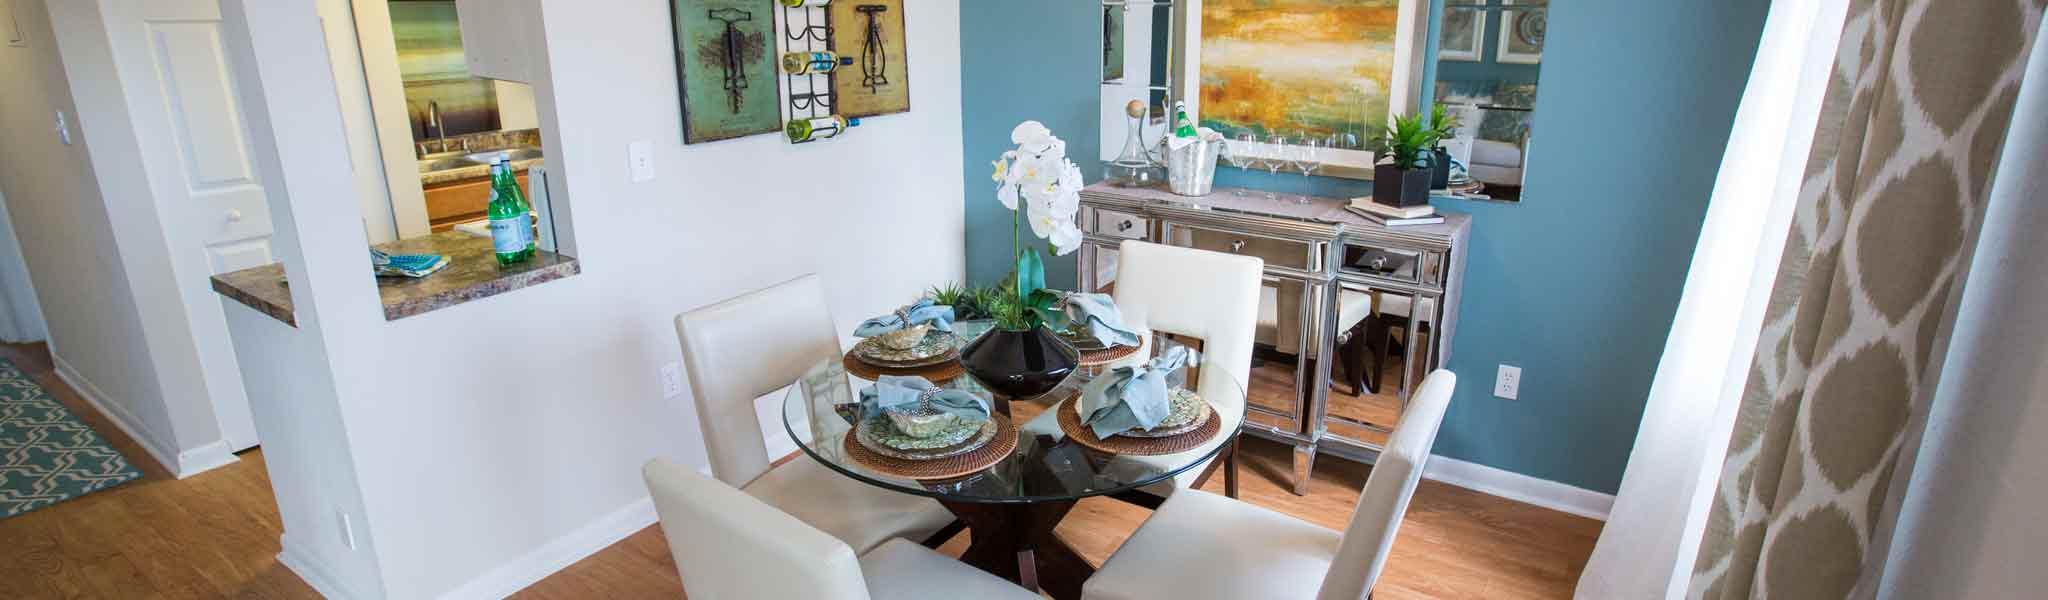 Winter Park FL Apartments For Rent